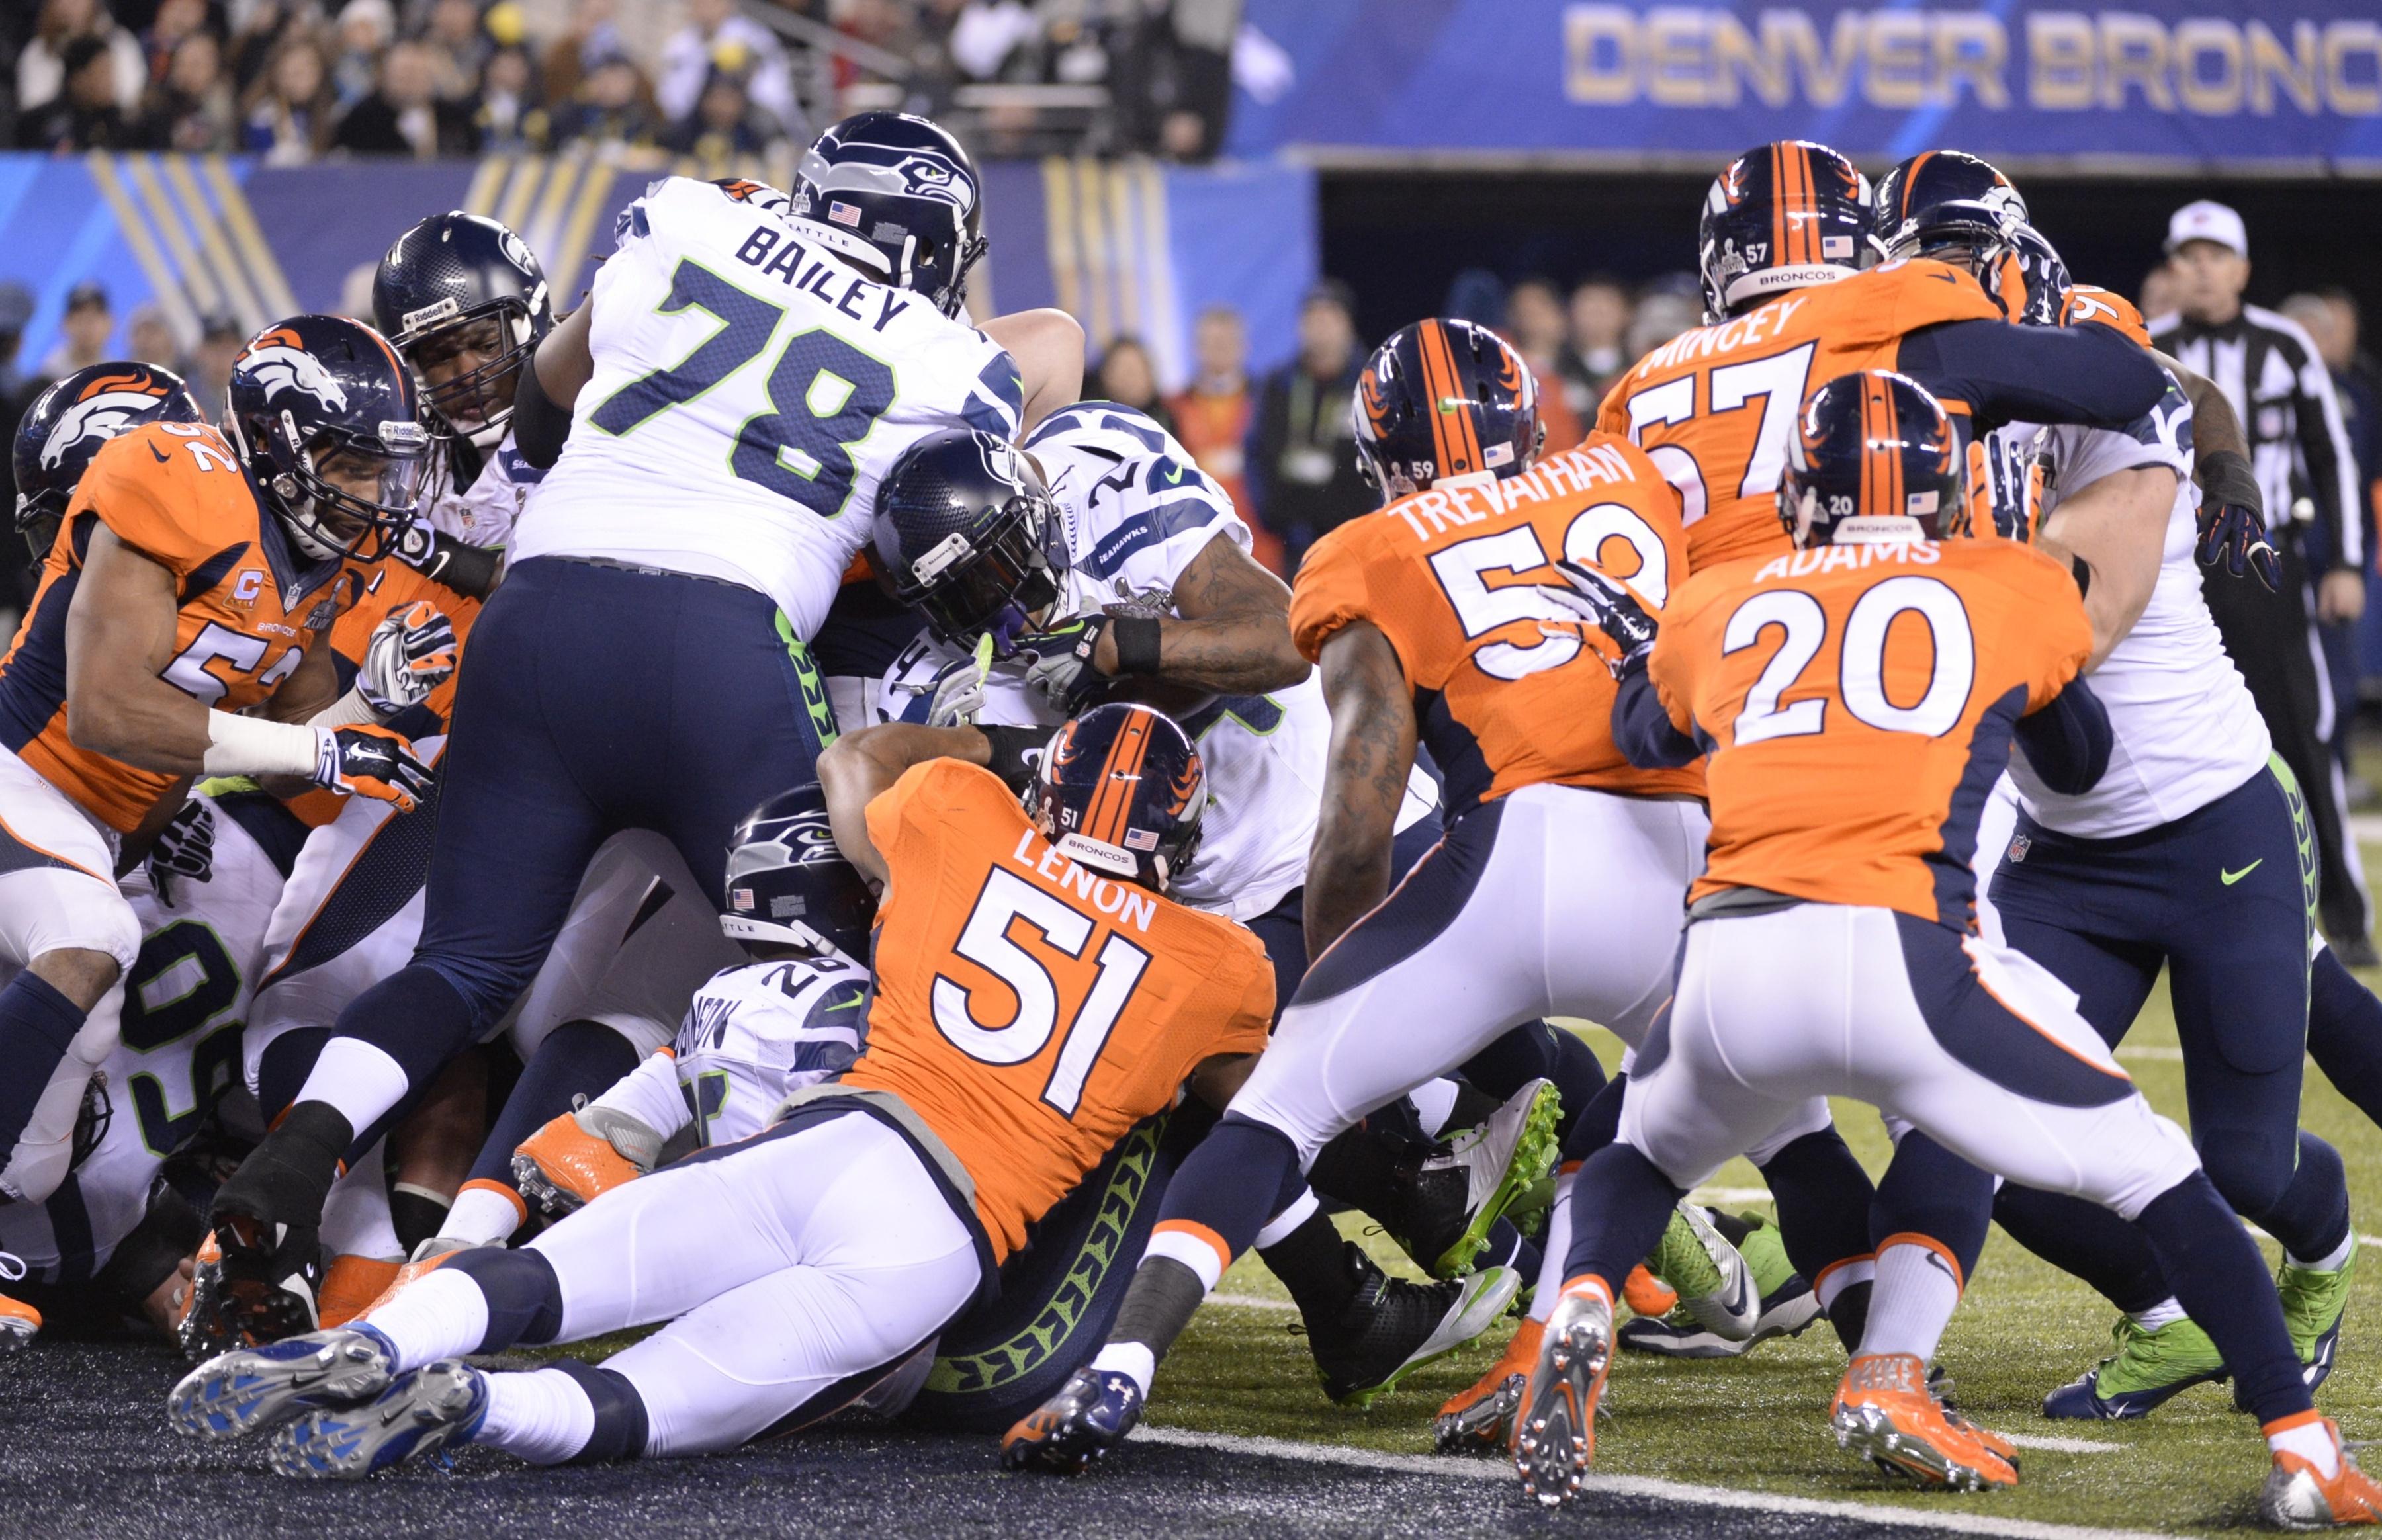 scores a 1 yard touchdown against the Denver Broncos during Super Bowl 3600x2328